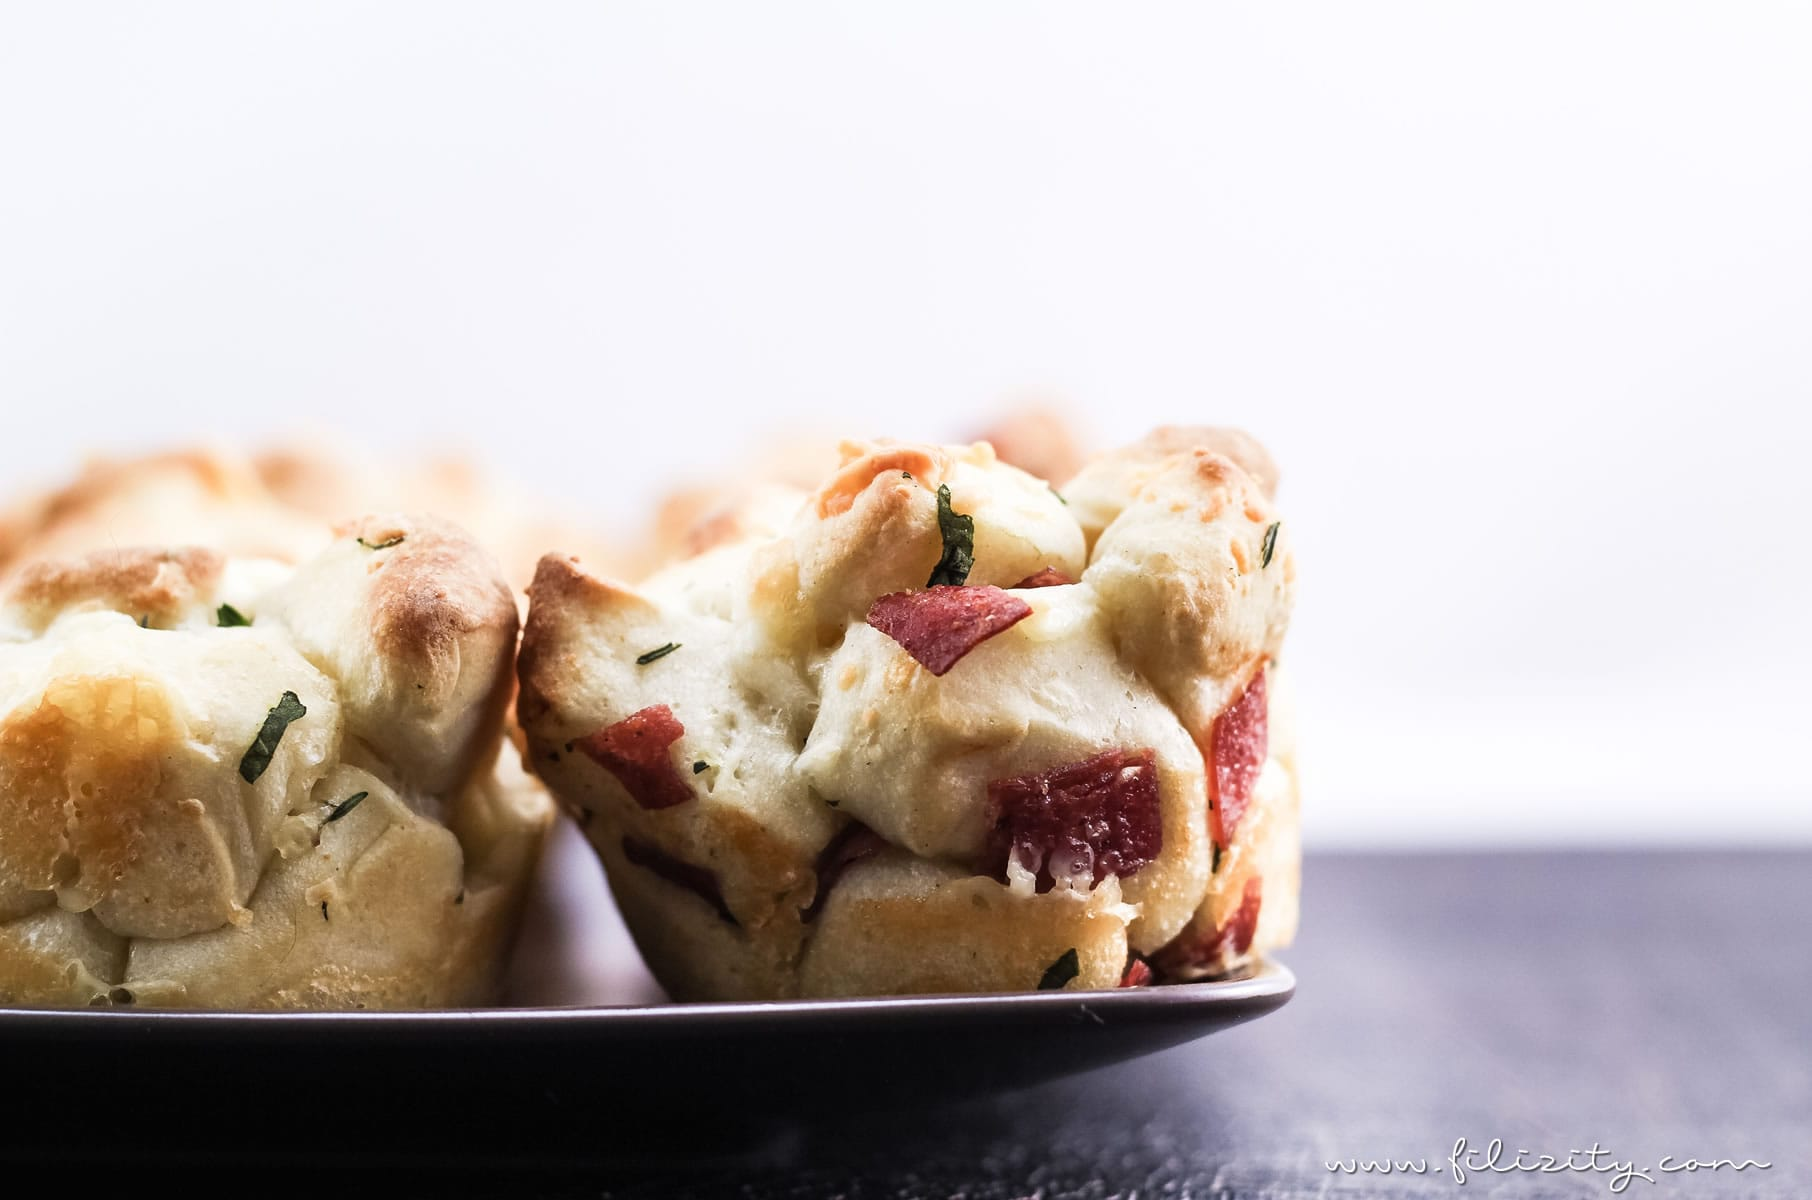 Schnelle Pizza-Muffins - Leckeres Fingerfood für's Party-Buffet | Filizity.com | Food-Blog aus dem Rheinland #partyfood #silvester #nye #pizza